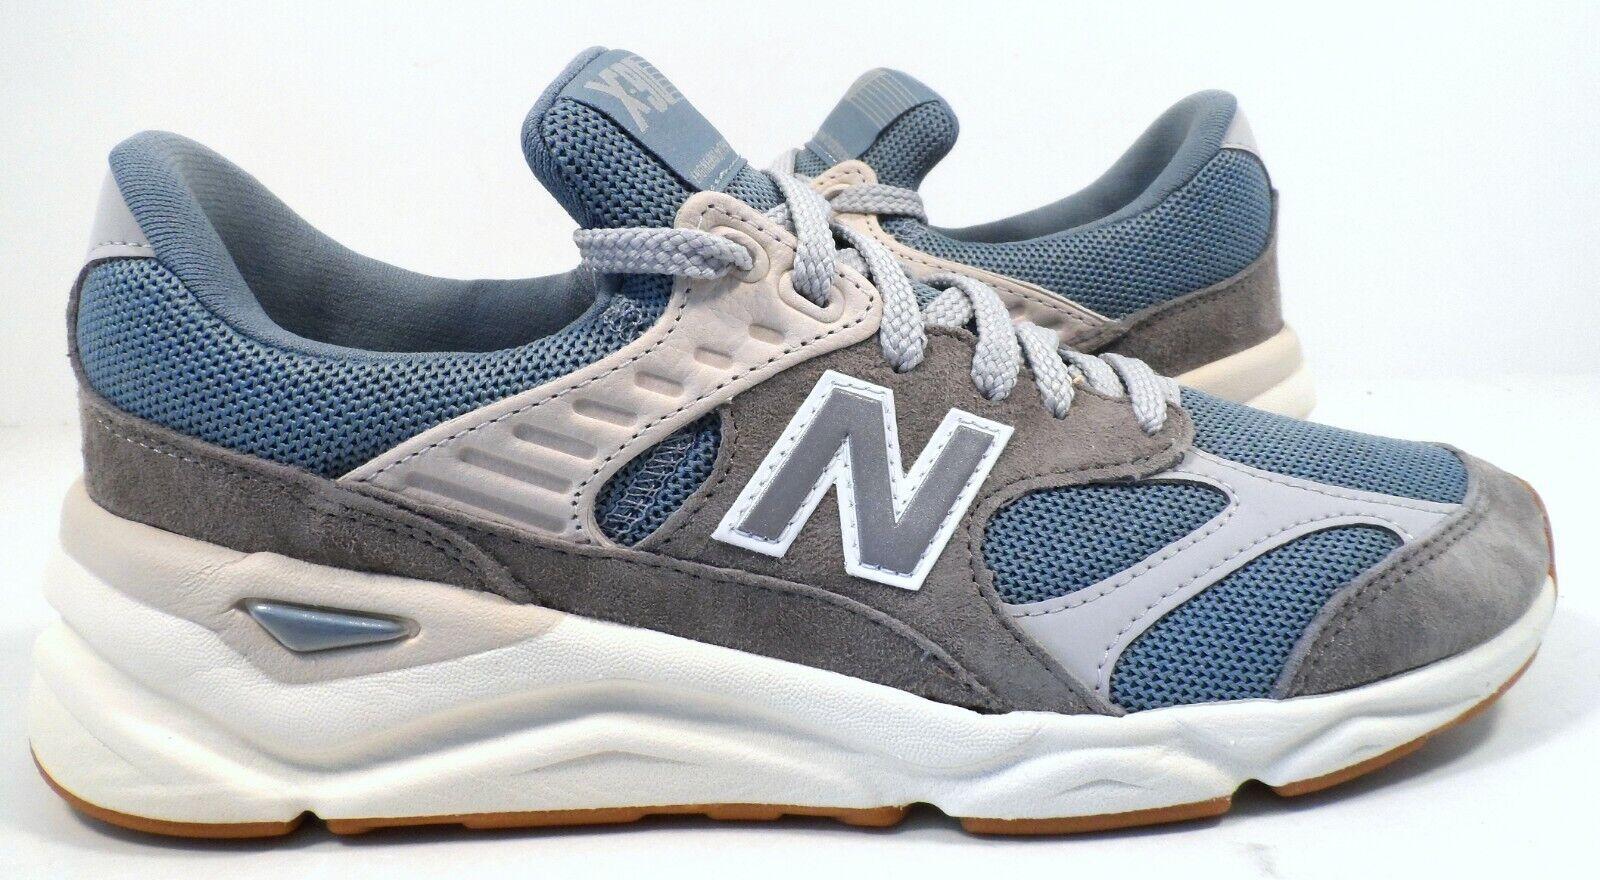 New Para Hombre Zapato X90 Reconstructed Balance Cyclone Azul gris Tamaño 10 Marblehead